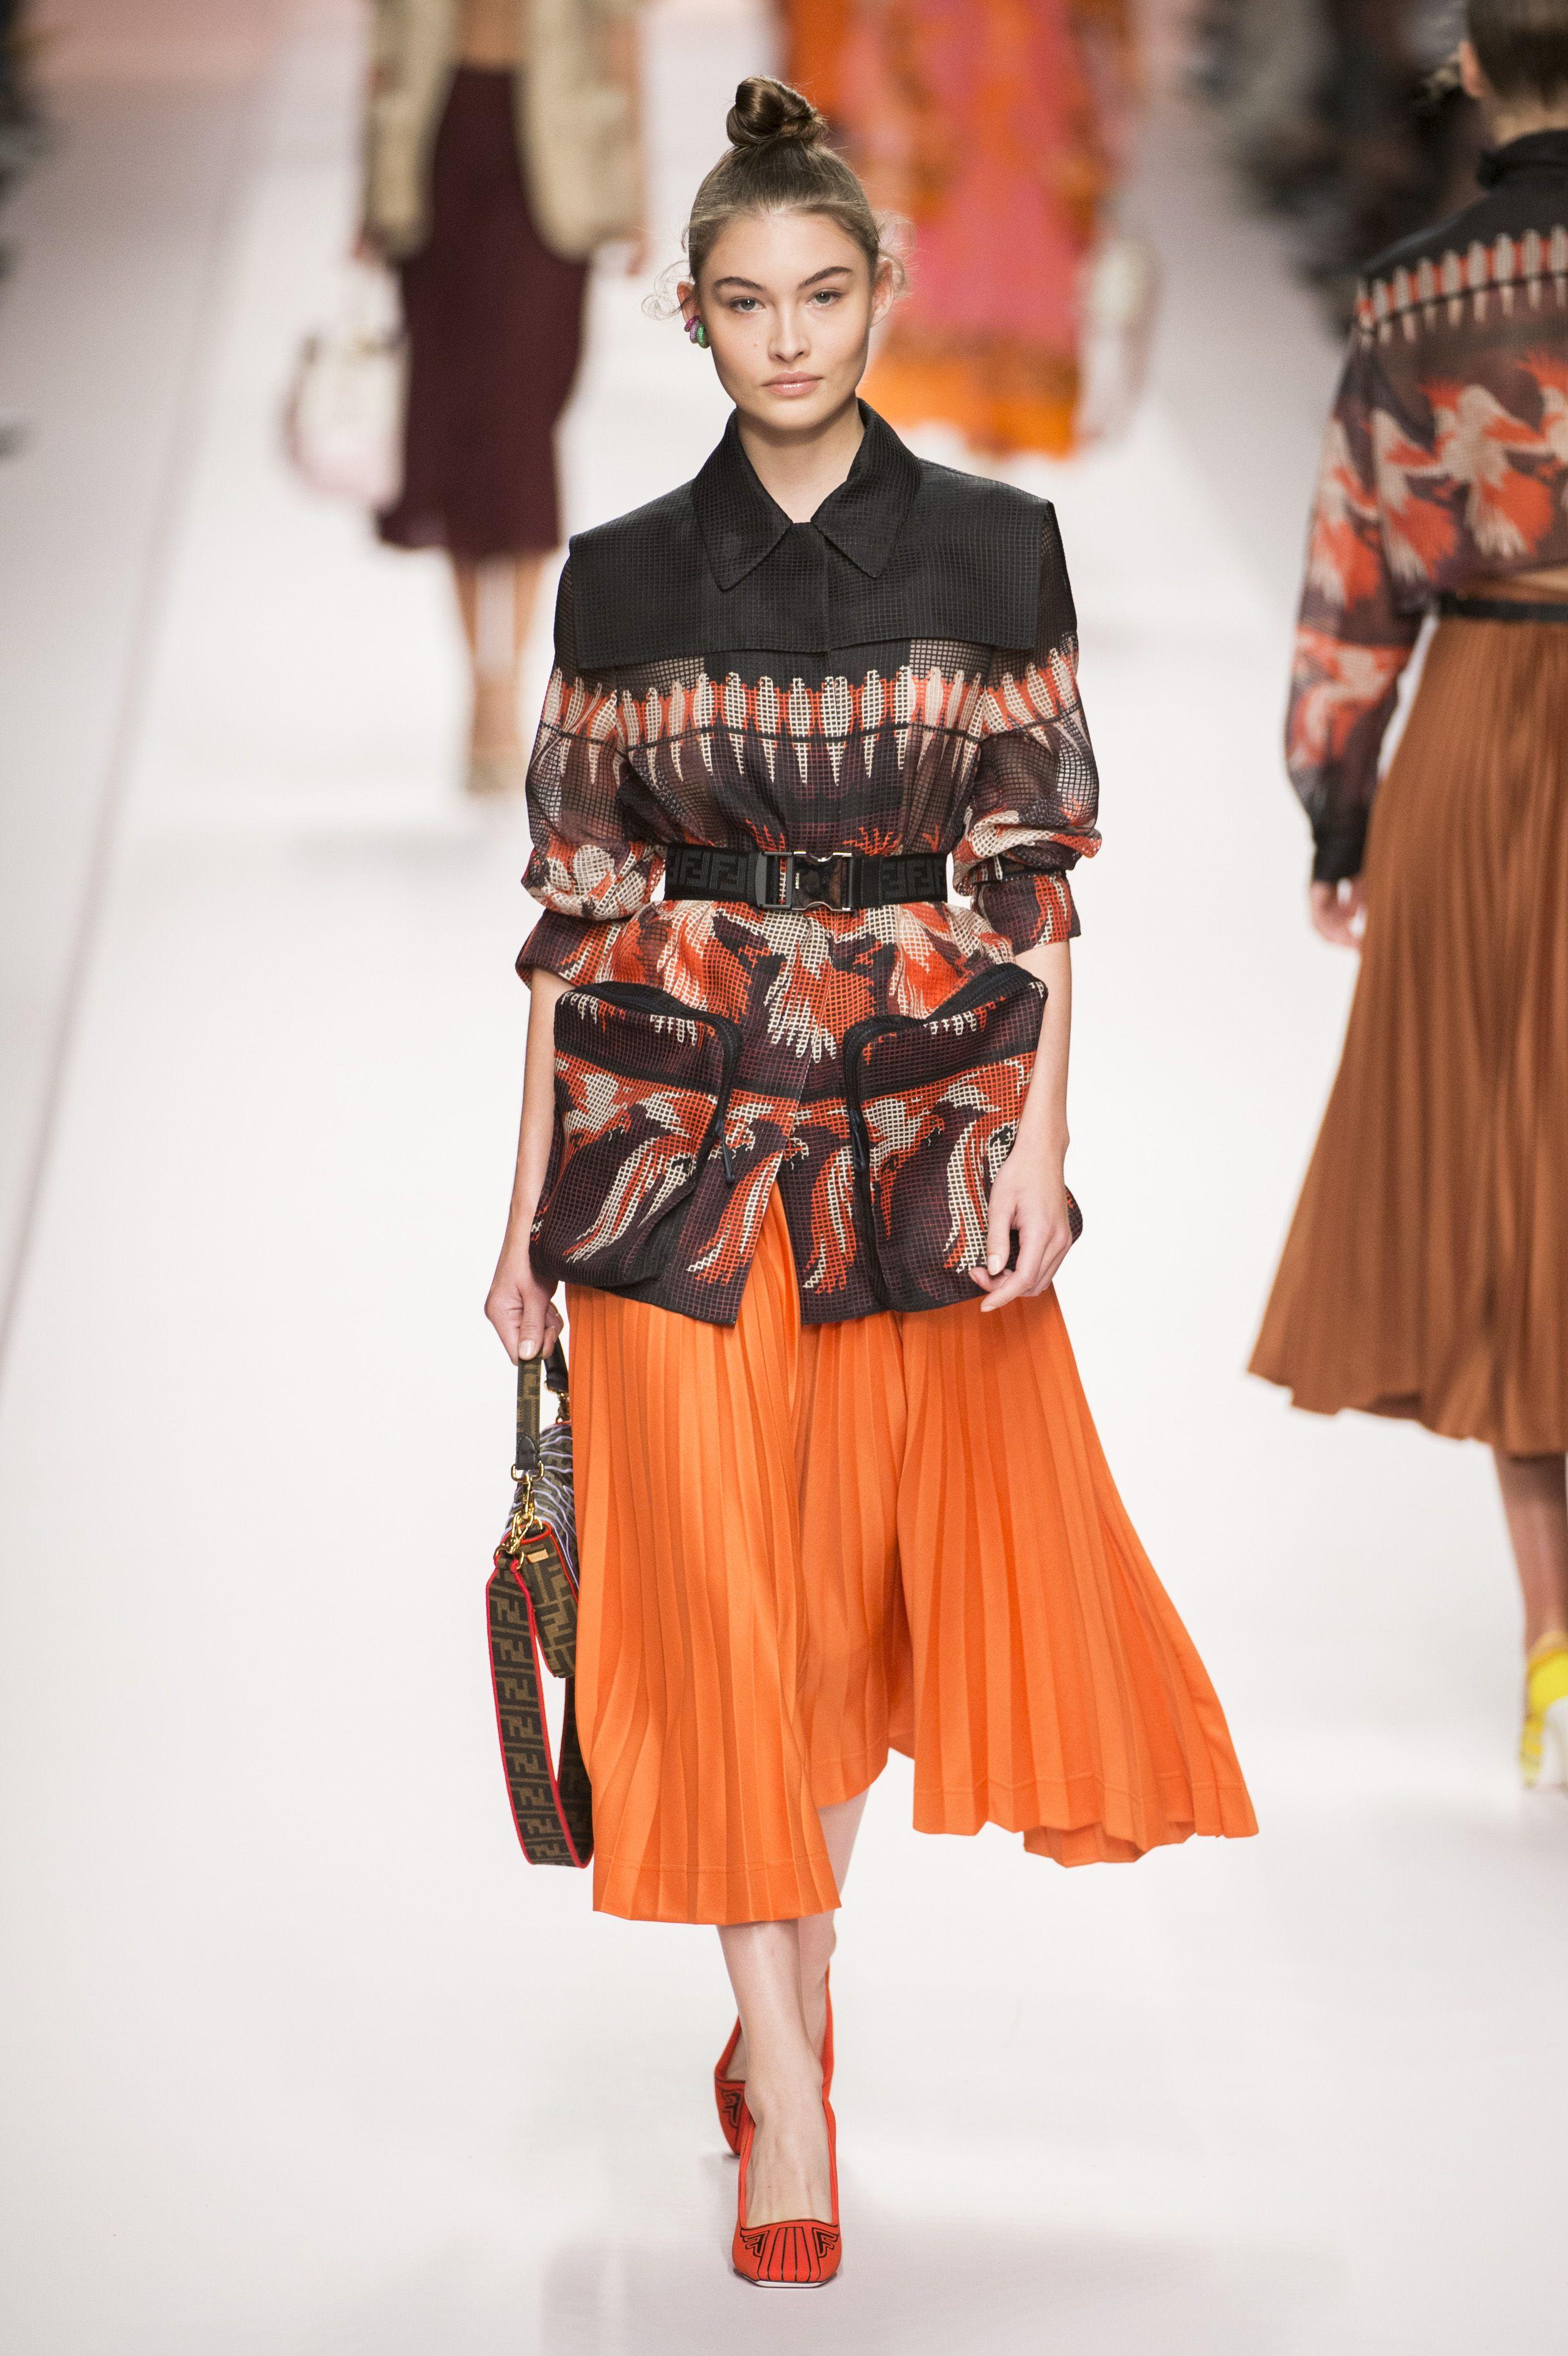 outfit elegante donna, come creare un outfit, come creare outfit perfetti,  outfit anni